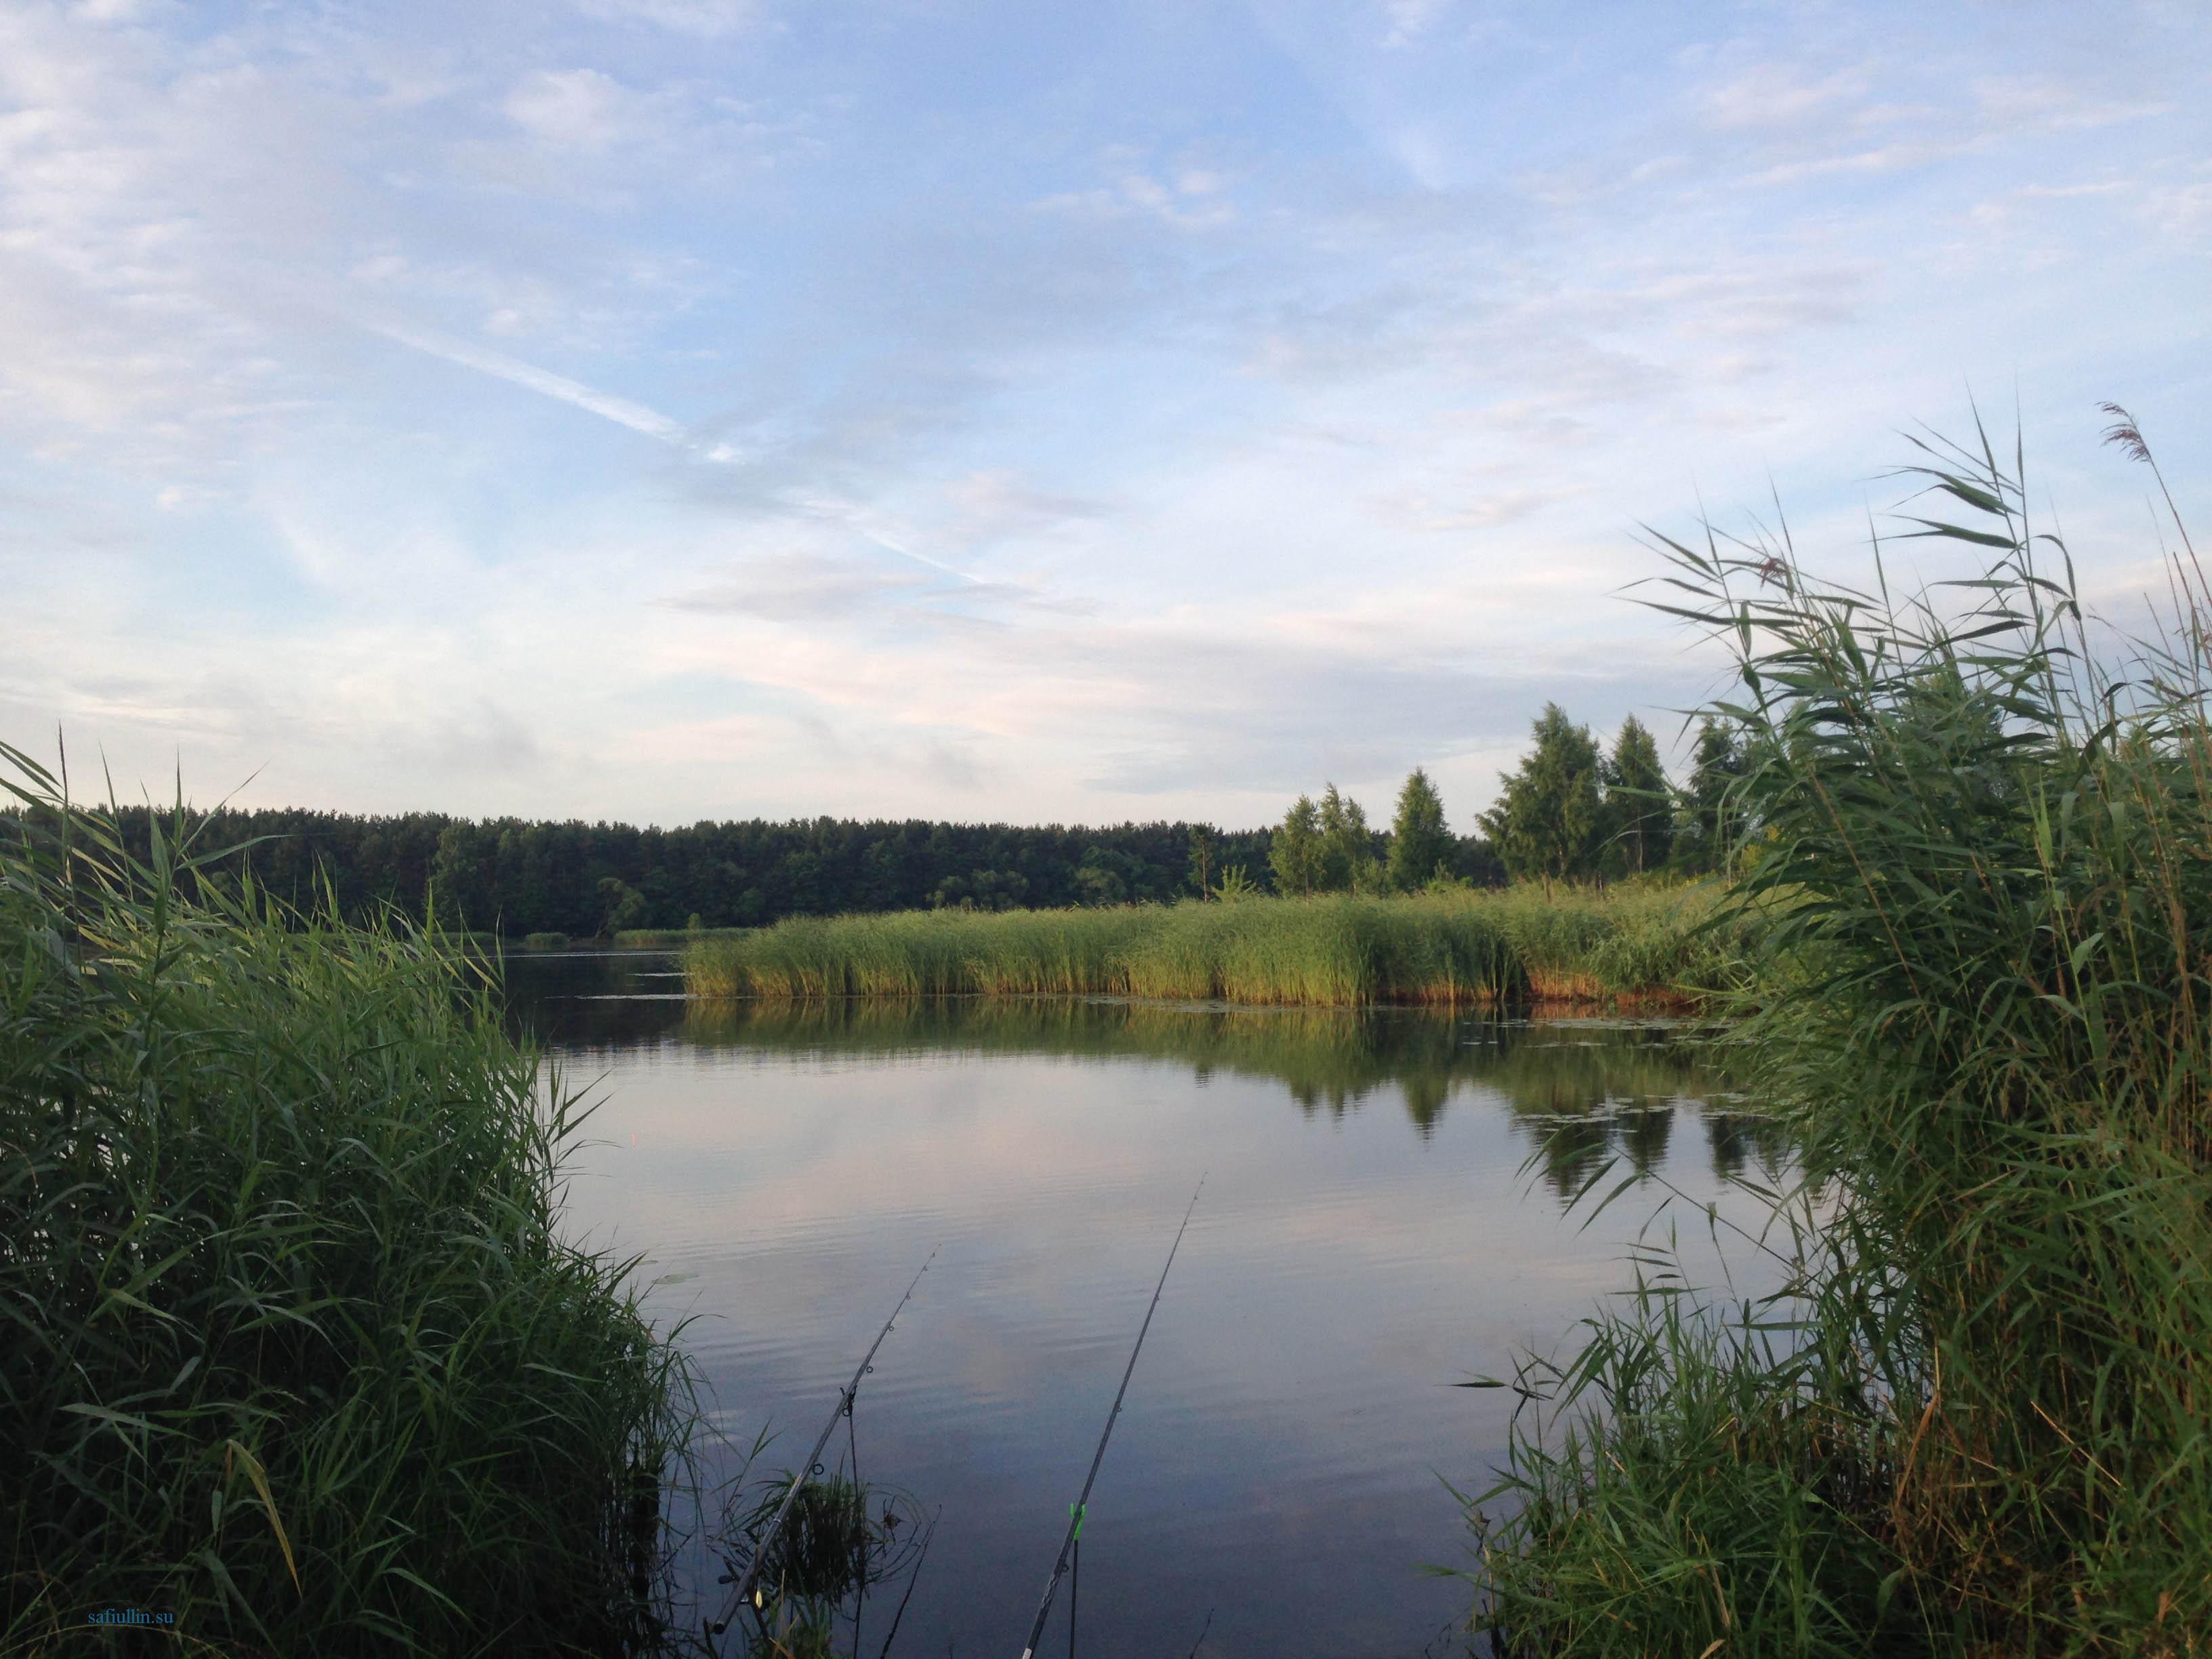 пейзажи природы альберт сафиуллин лето утро рыбалка река лиелупе